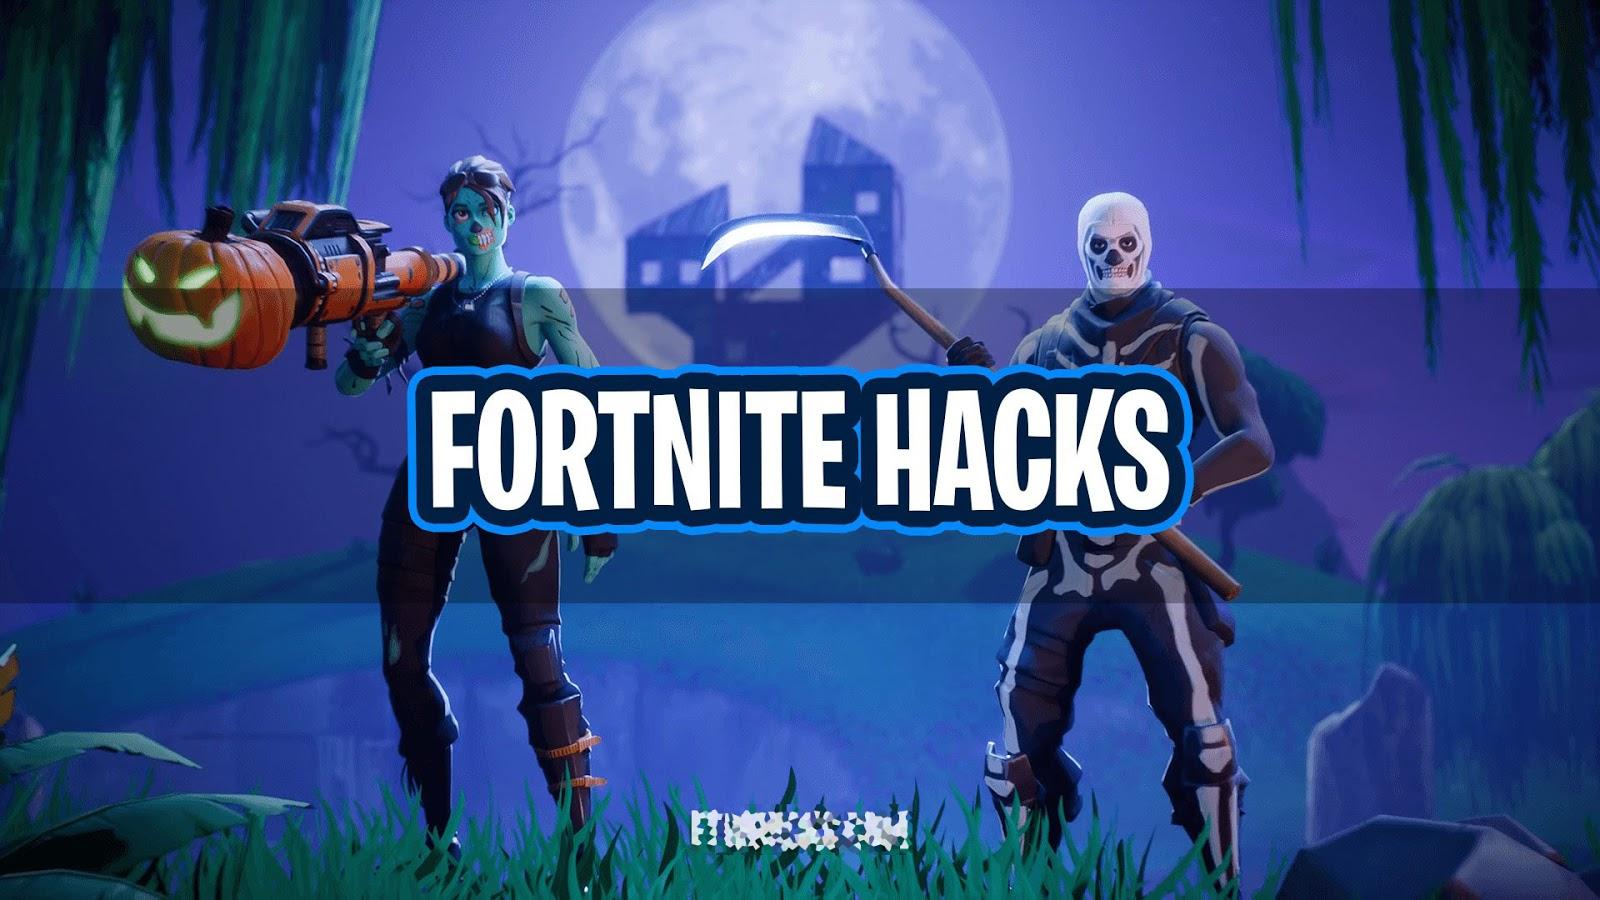 Fortnite Hack Aimbot And V Bucks Hack